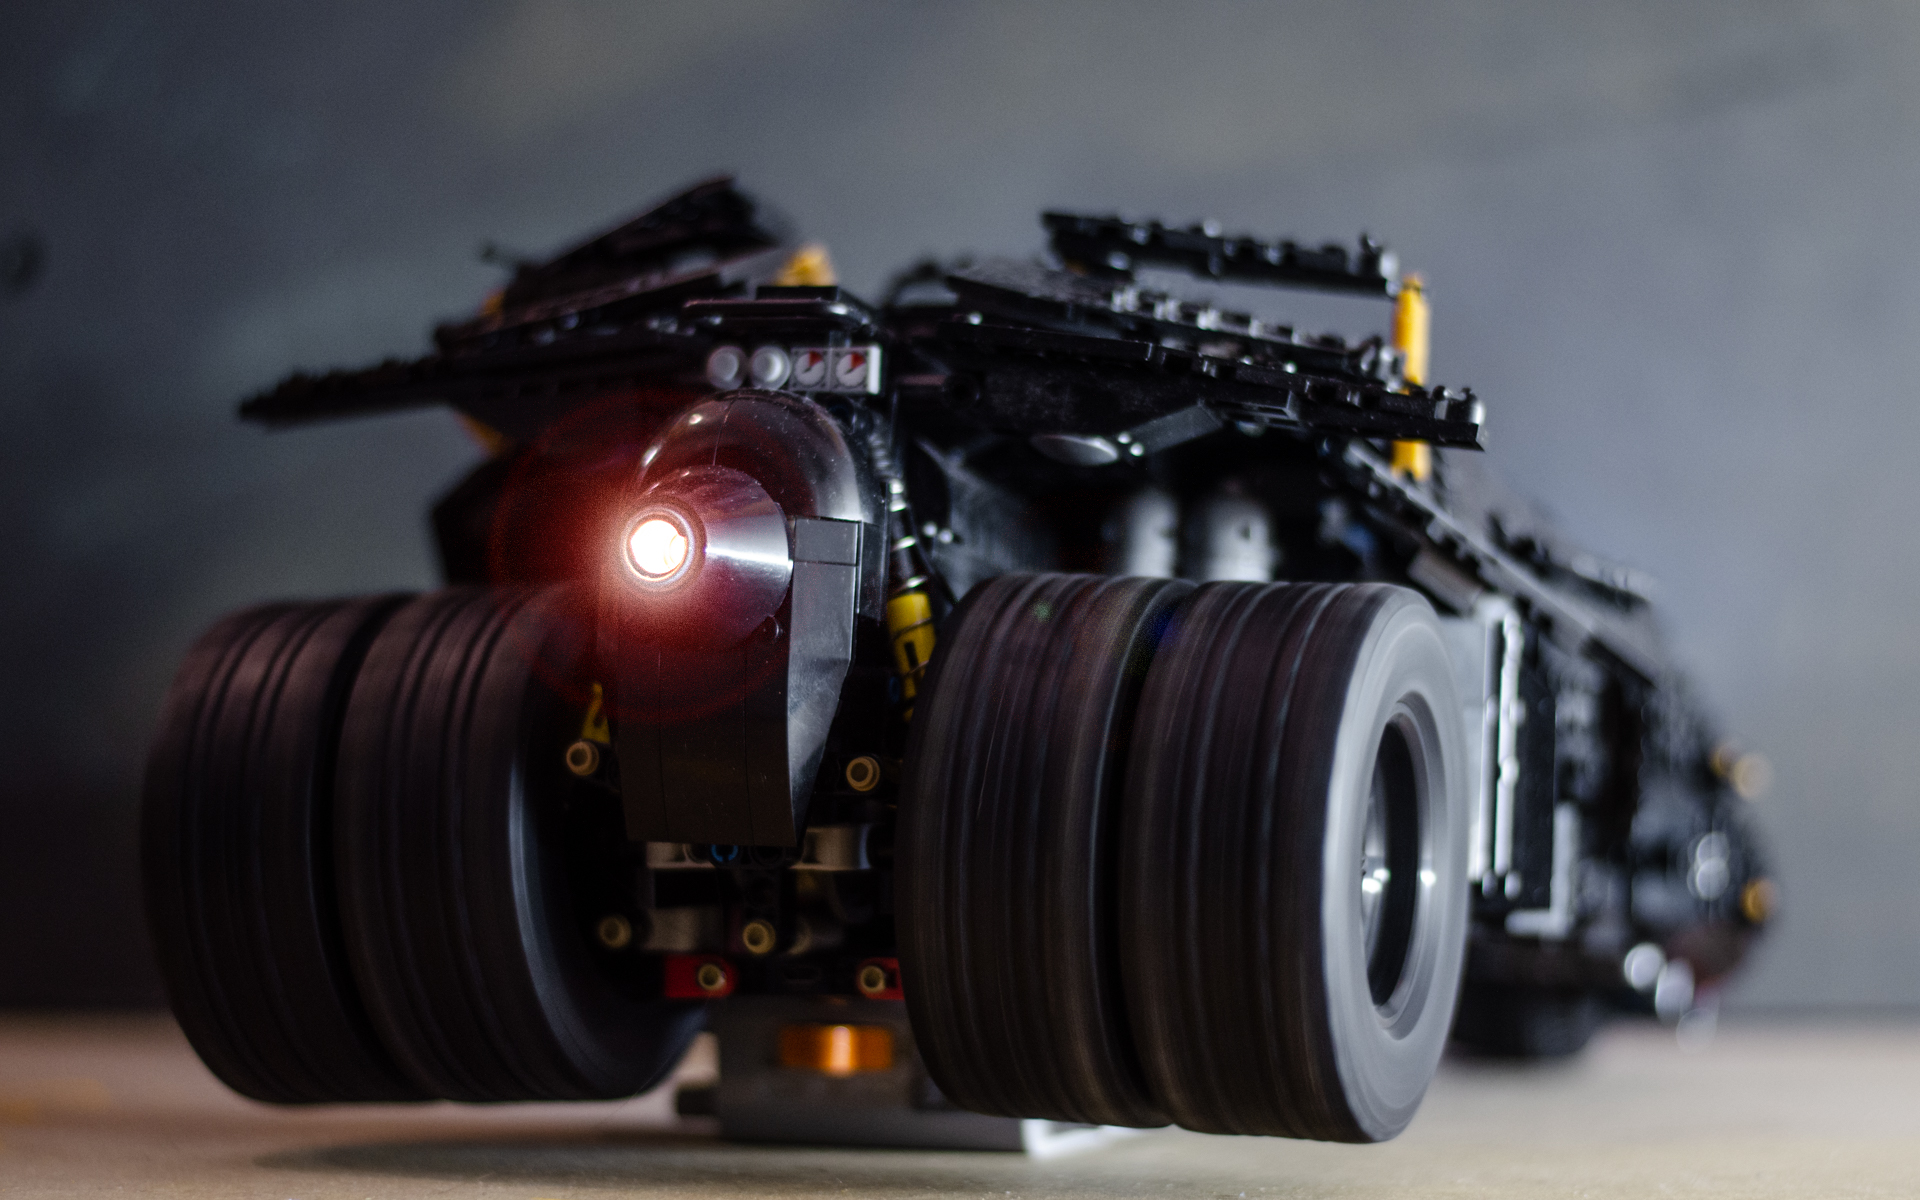 76023_lego_tumbler_motorized_power_functions_DSC_8458